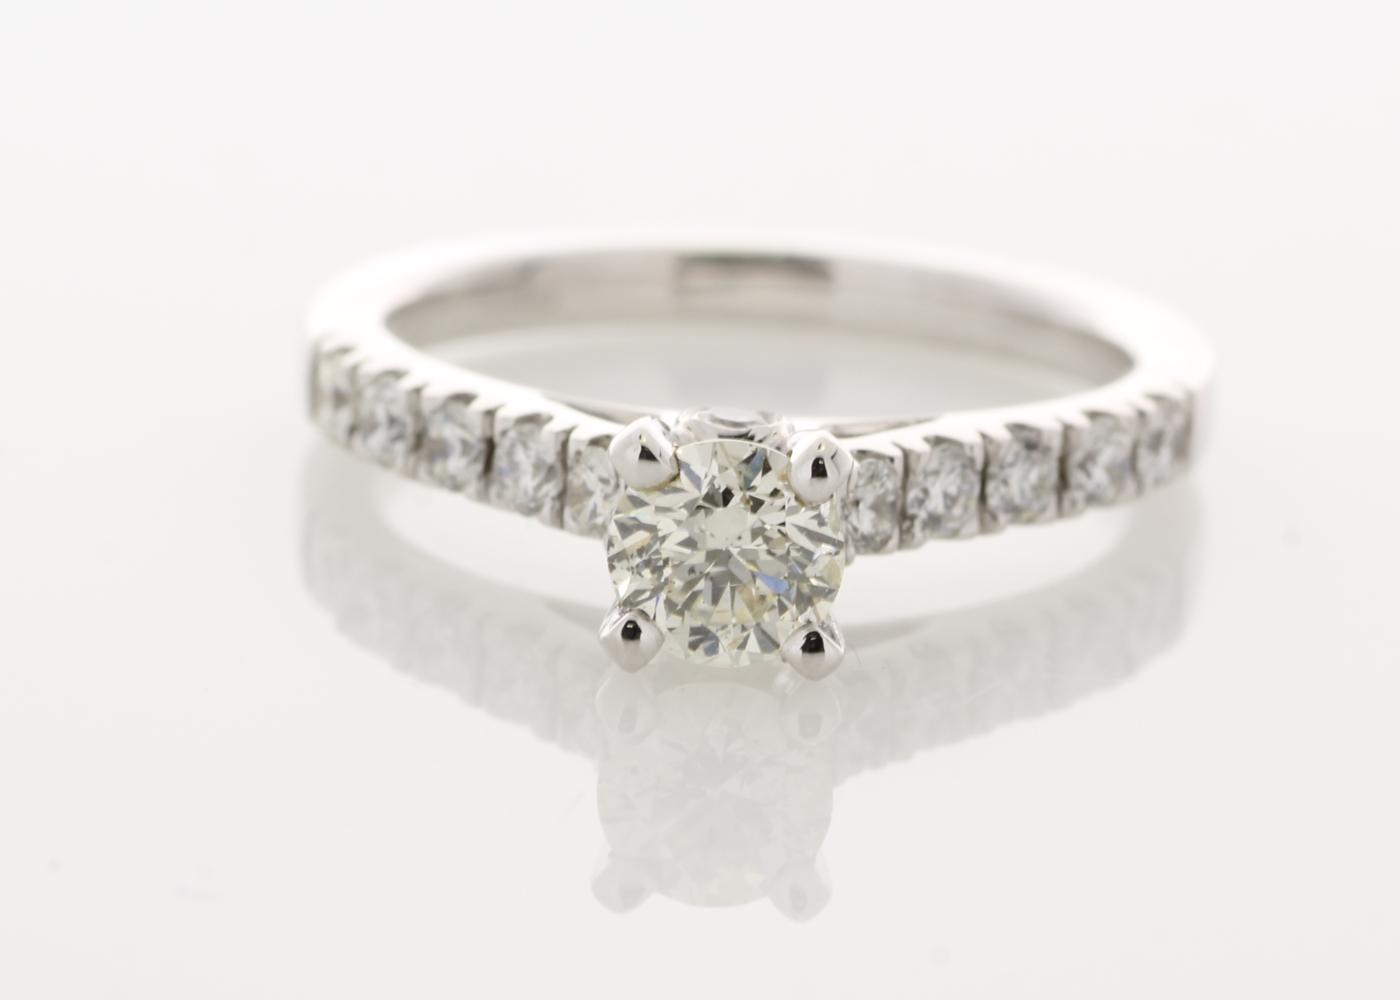 18k White Gold Stone Set Shoulders Diamond Ring 0.91 Carats